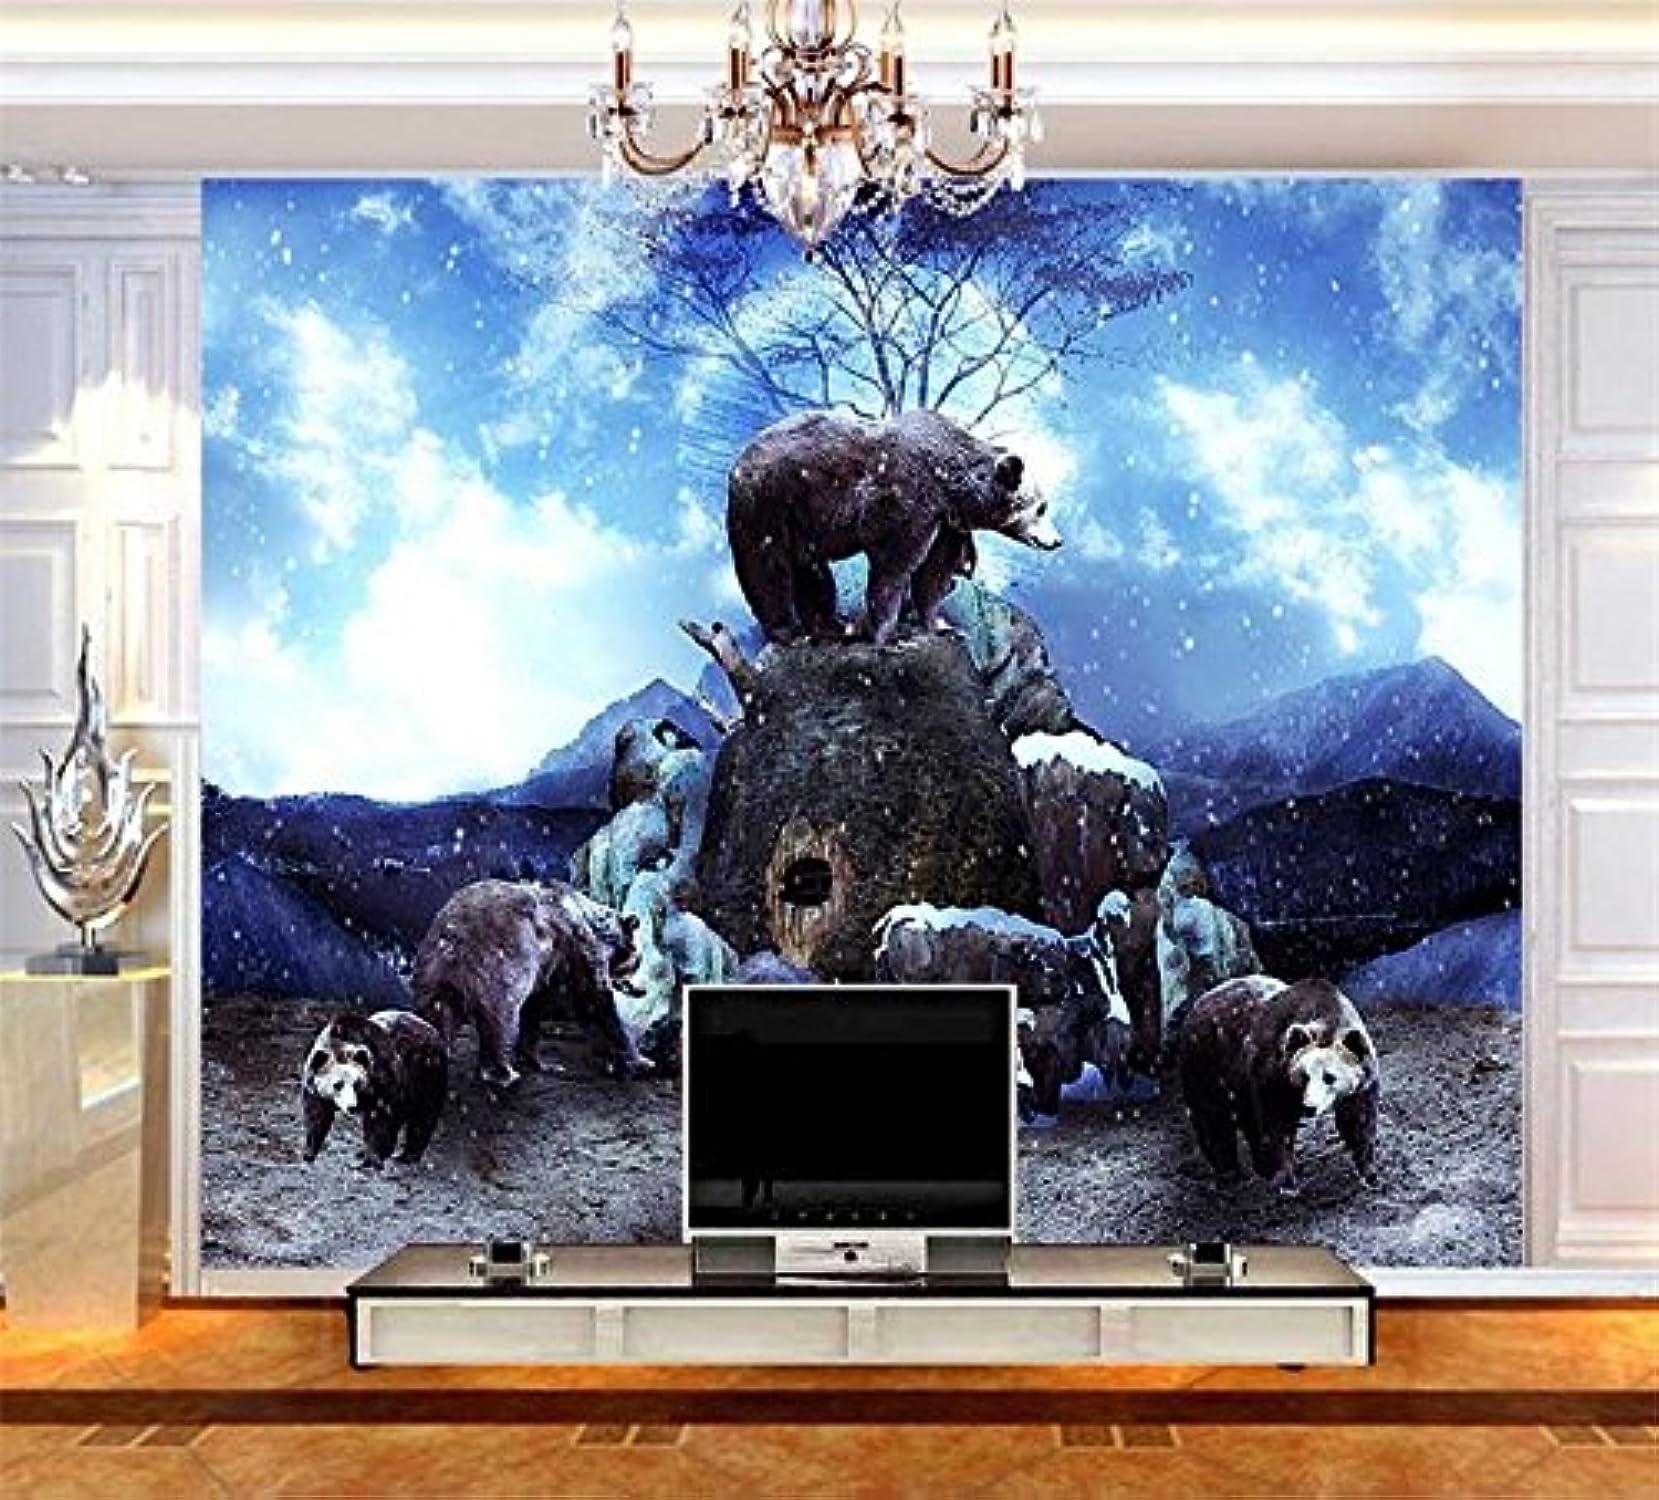 venta directa de fábrica BZDHWWH Papel Tapiz Fotográfico 3D 3D 3D Tamao Personalizado Sala De Estar Oso Polar árbol Nieve Imagen Pintura Sofá Tv Fondo Etiqueta De La Parojo,210 Cm×150 Cm  marca de lujo